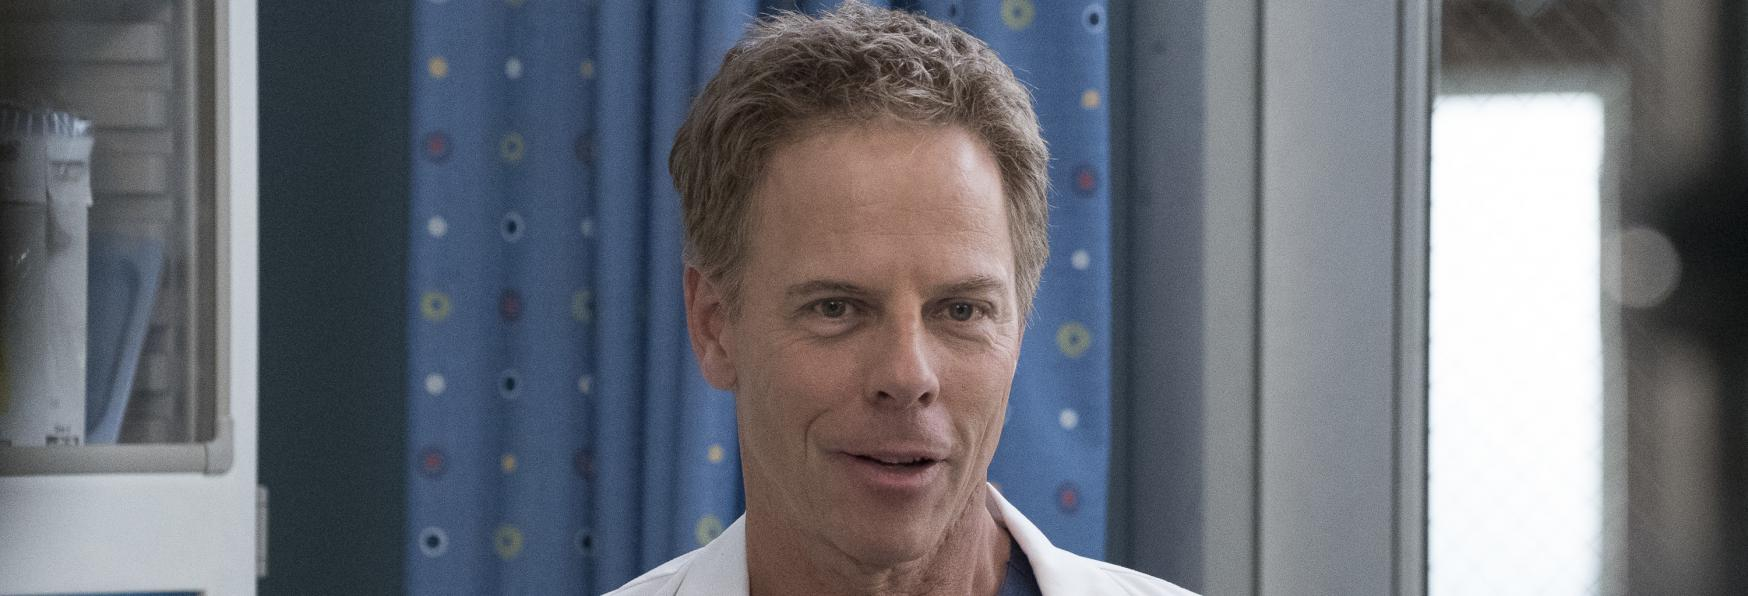 Grey's Anatomy: anche Greg Germann lascia la Serie TV targata ABC